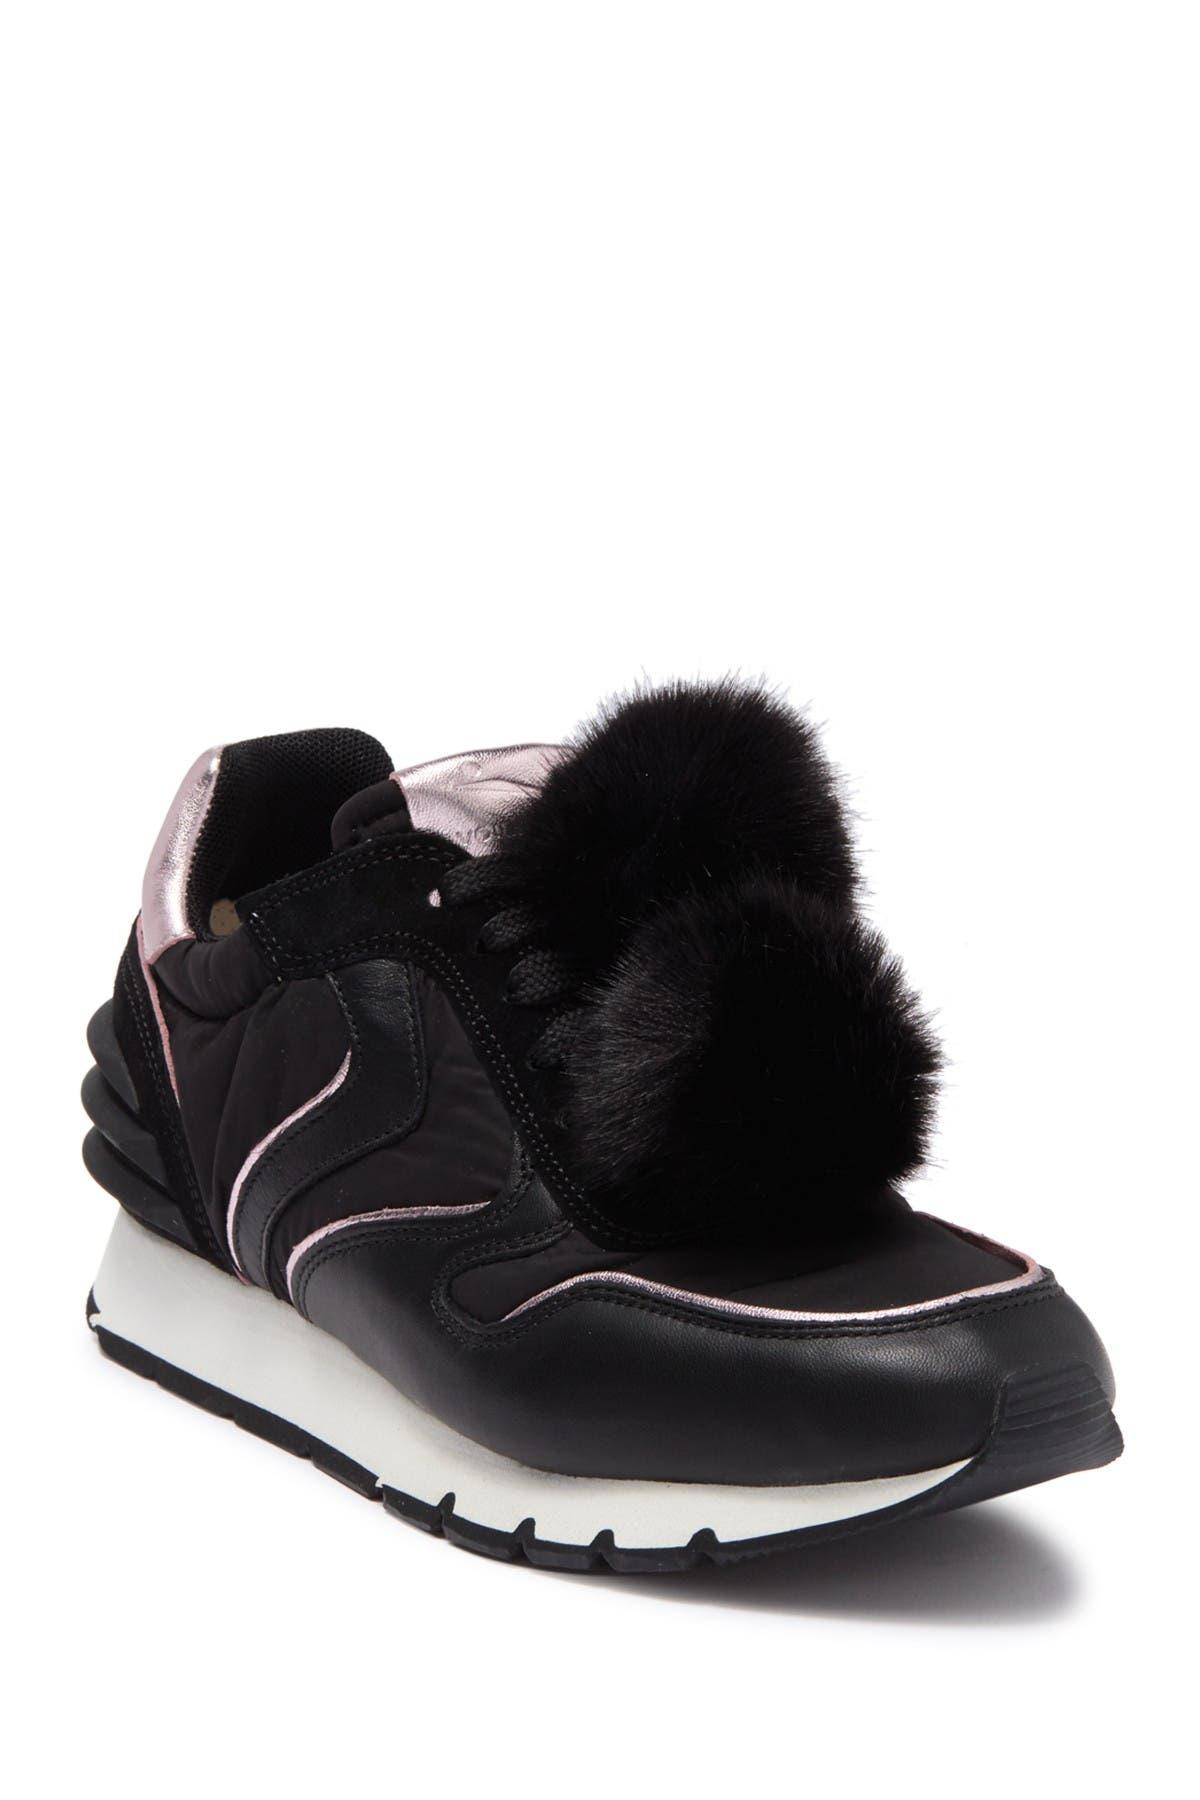 Image of Viola Blanche Julia Faux Fur Pompom Sneaker